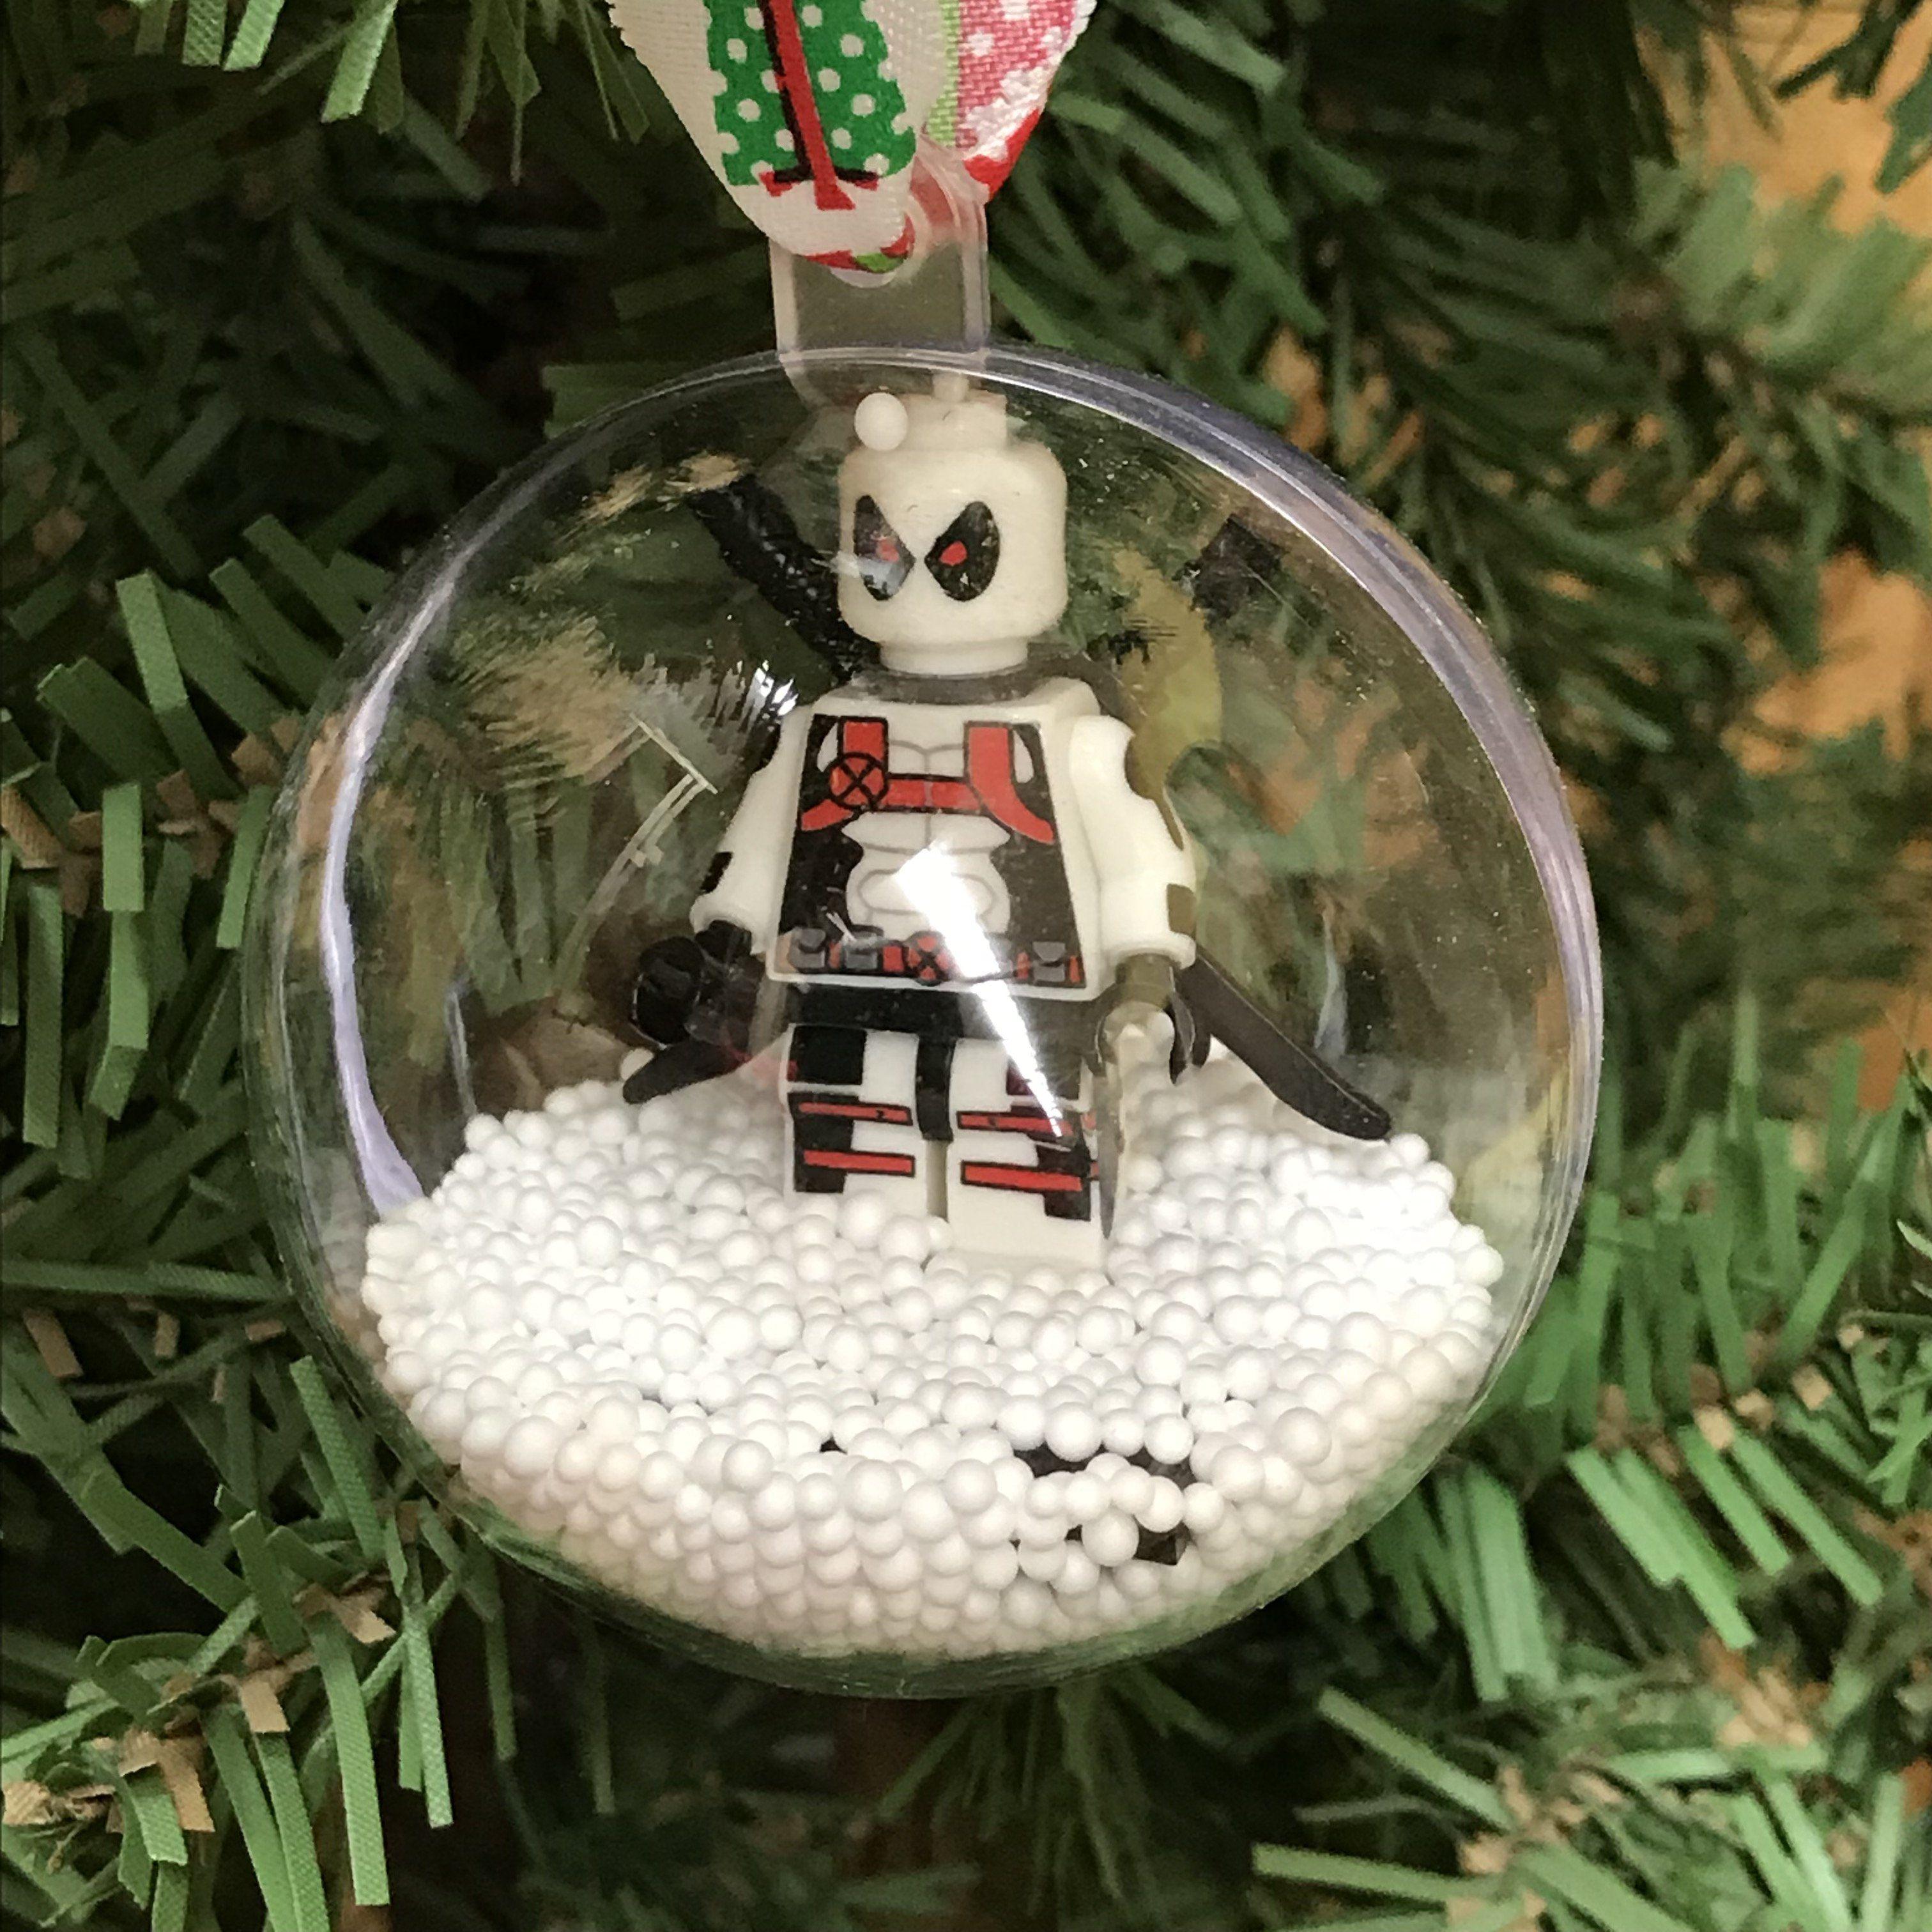 Holiday tree ornament marvel dc comic white deadpool lego figurine